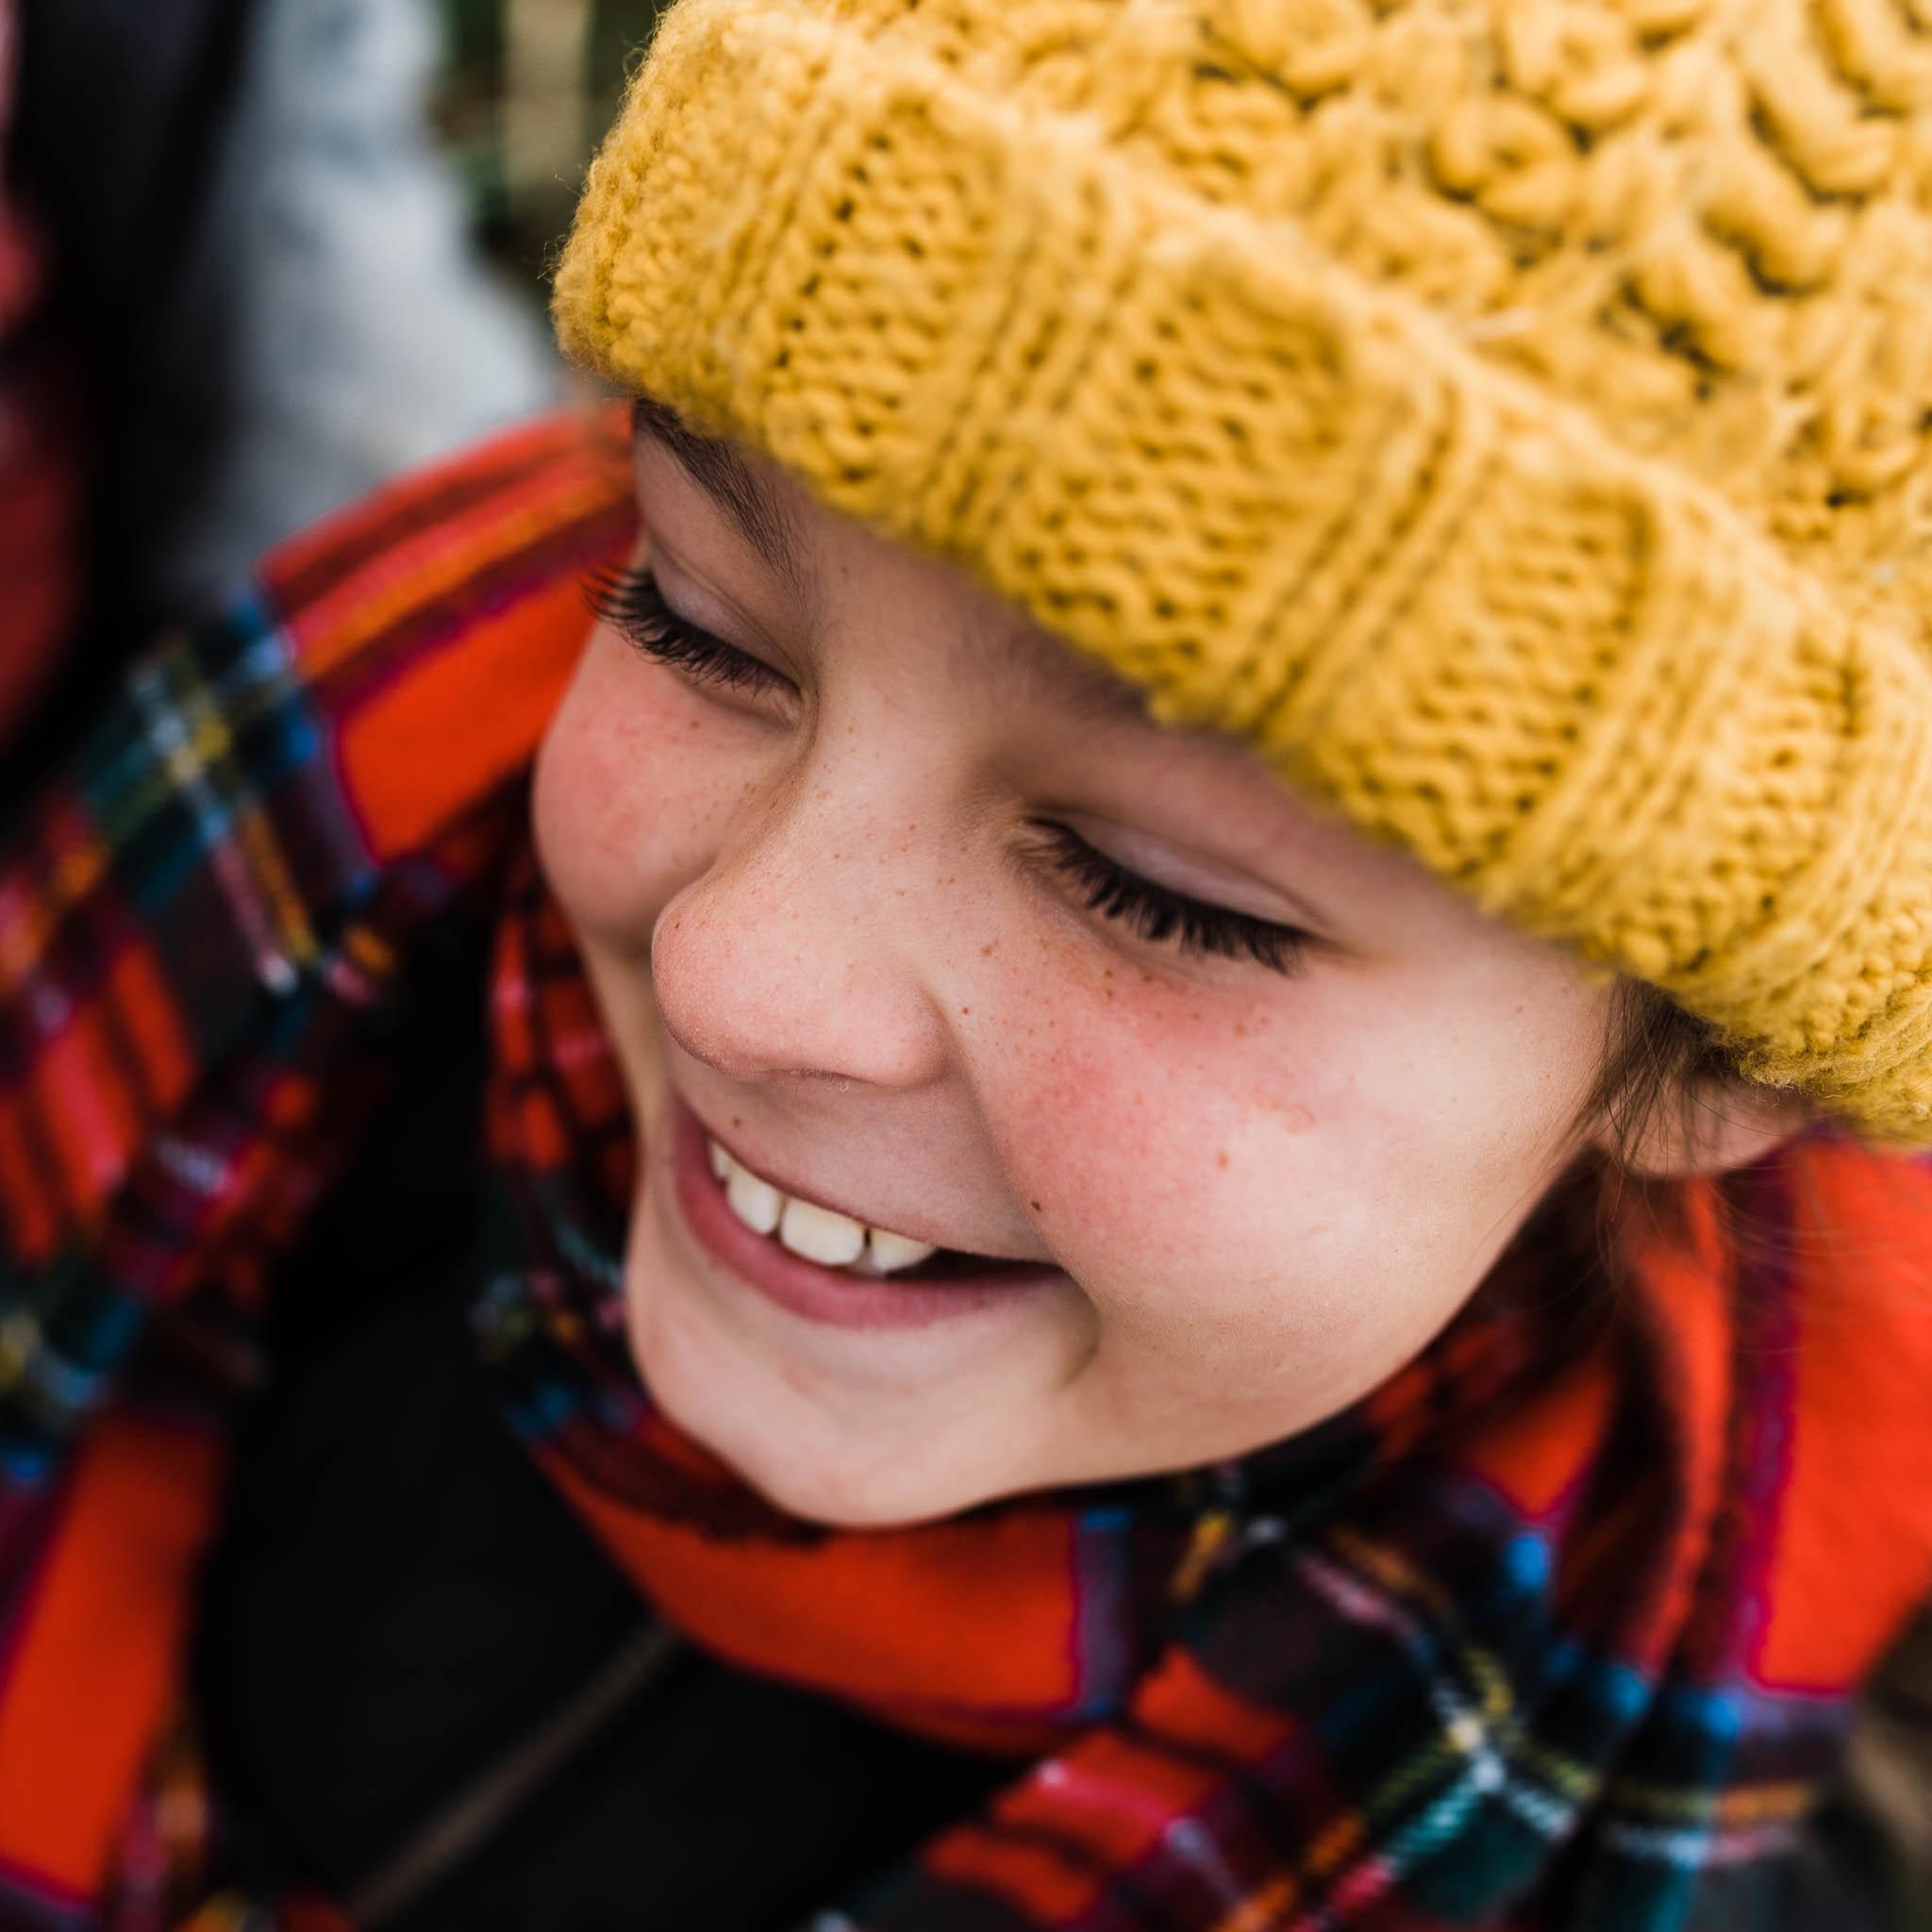 Little Girl in Hat laughing_CheltenhamPhotographerChuiKingLi-0549.jpg